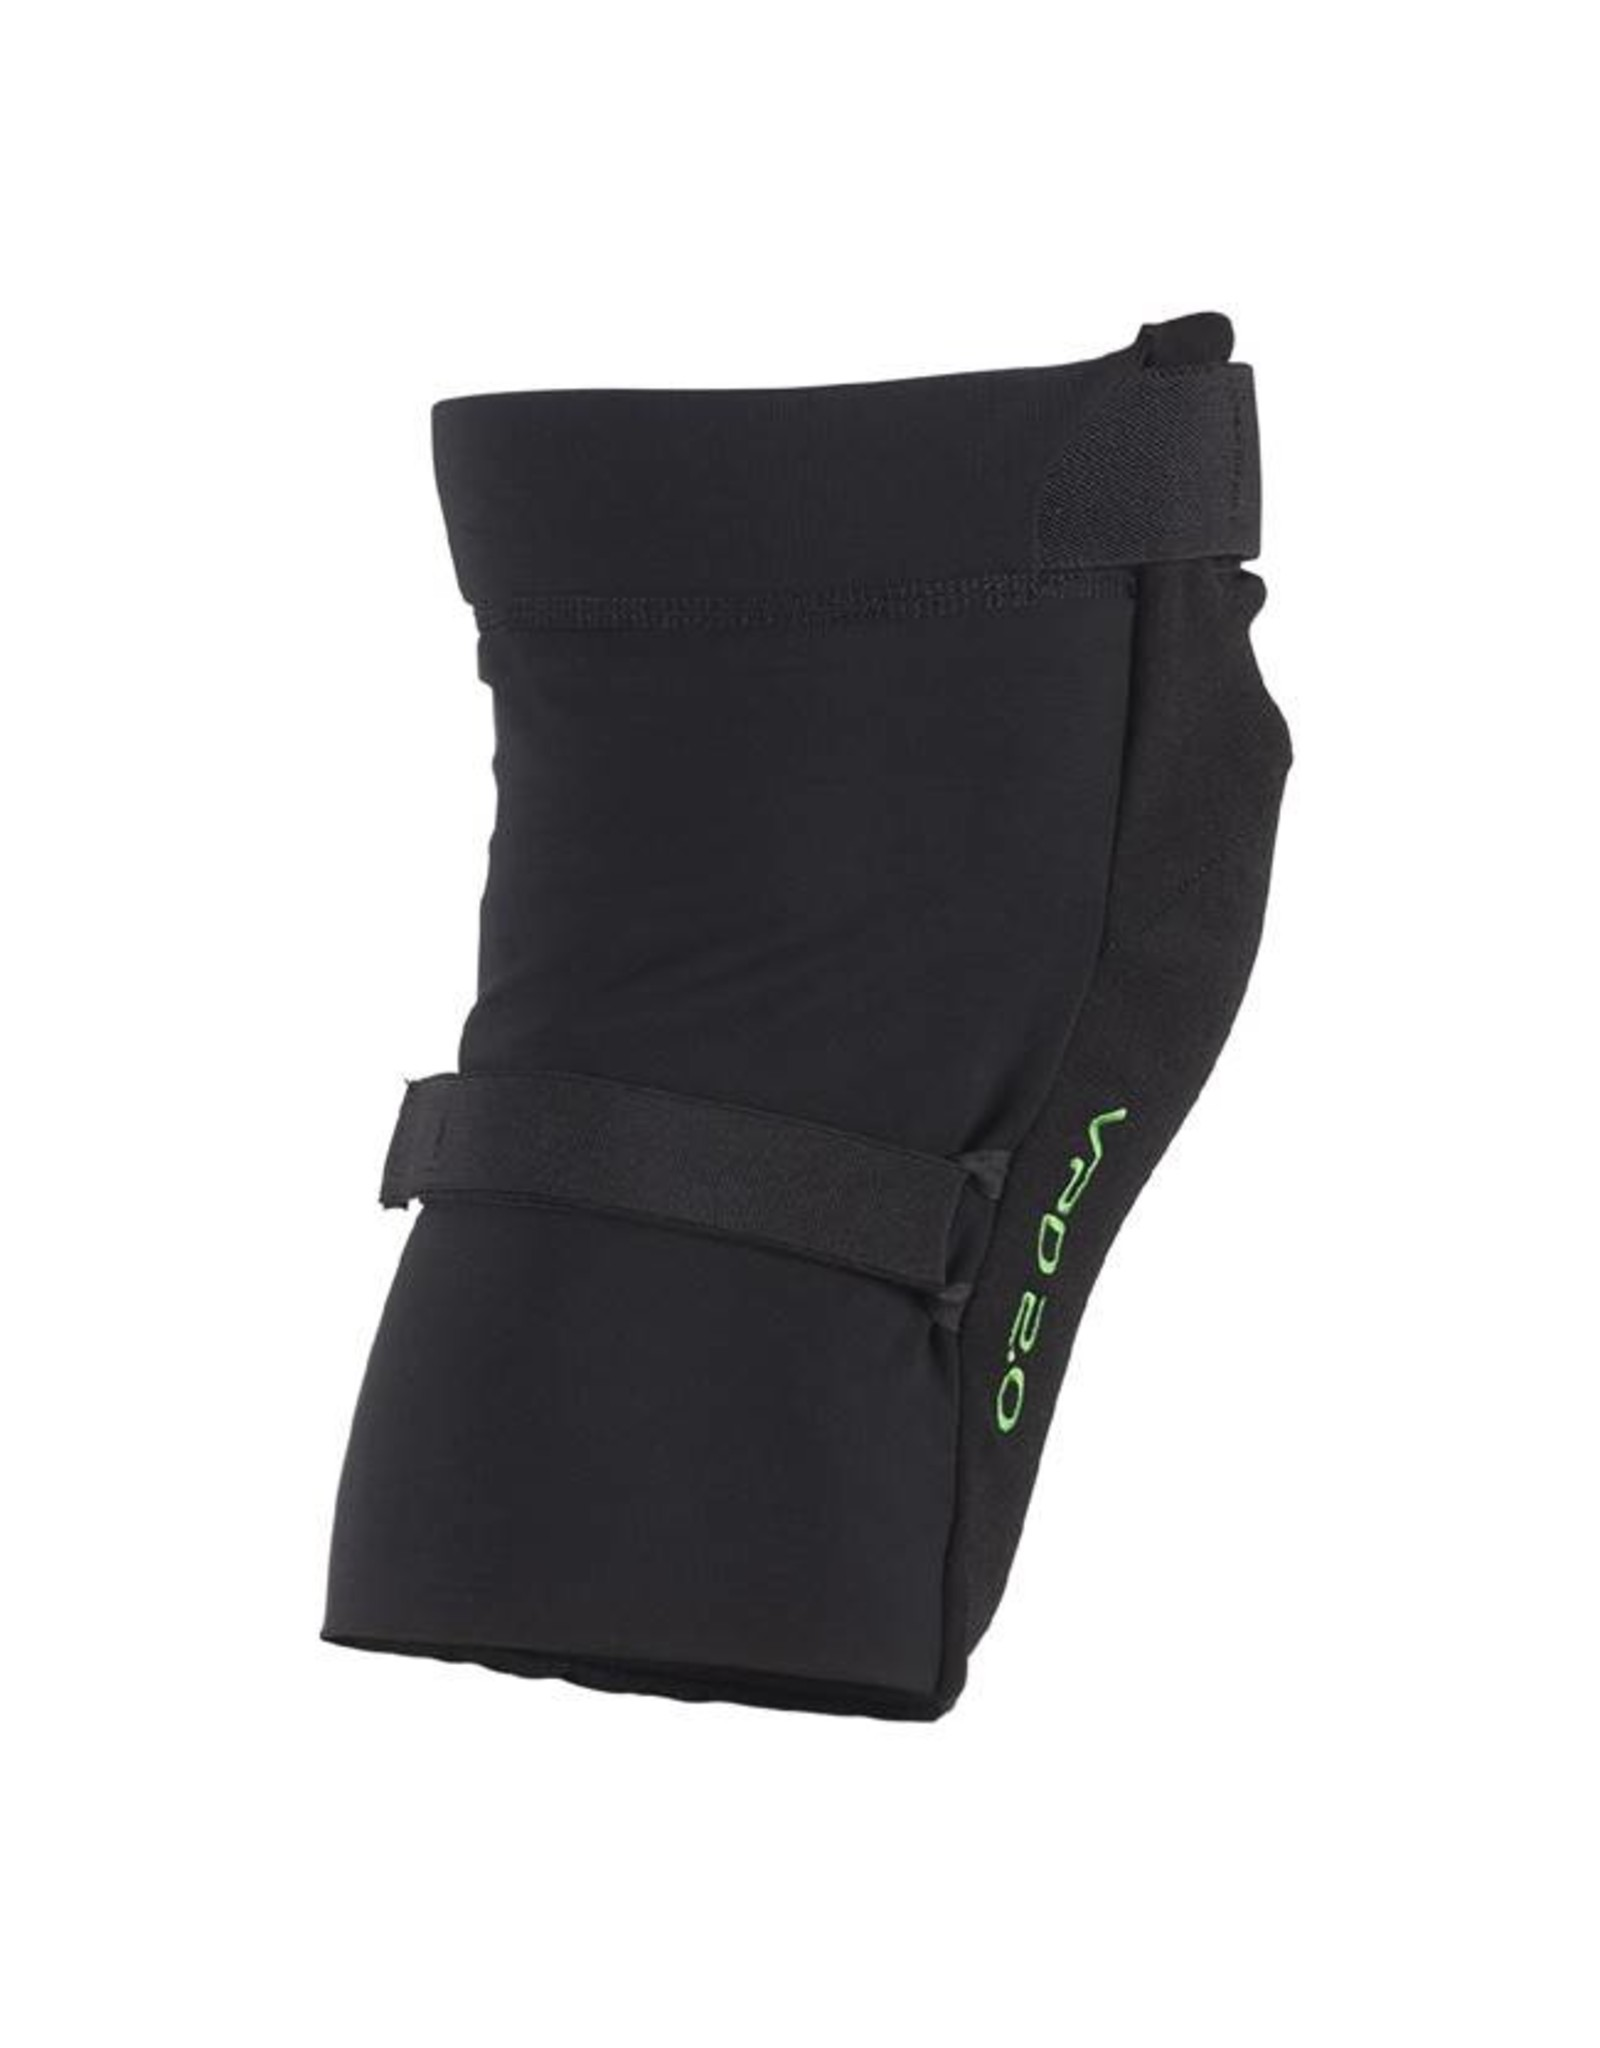 POC POC Joint VPD 2.0 Protective Knee Guard: Black MD